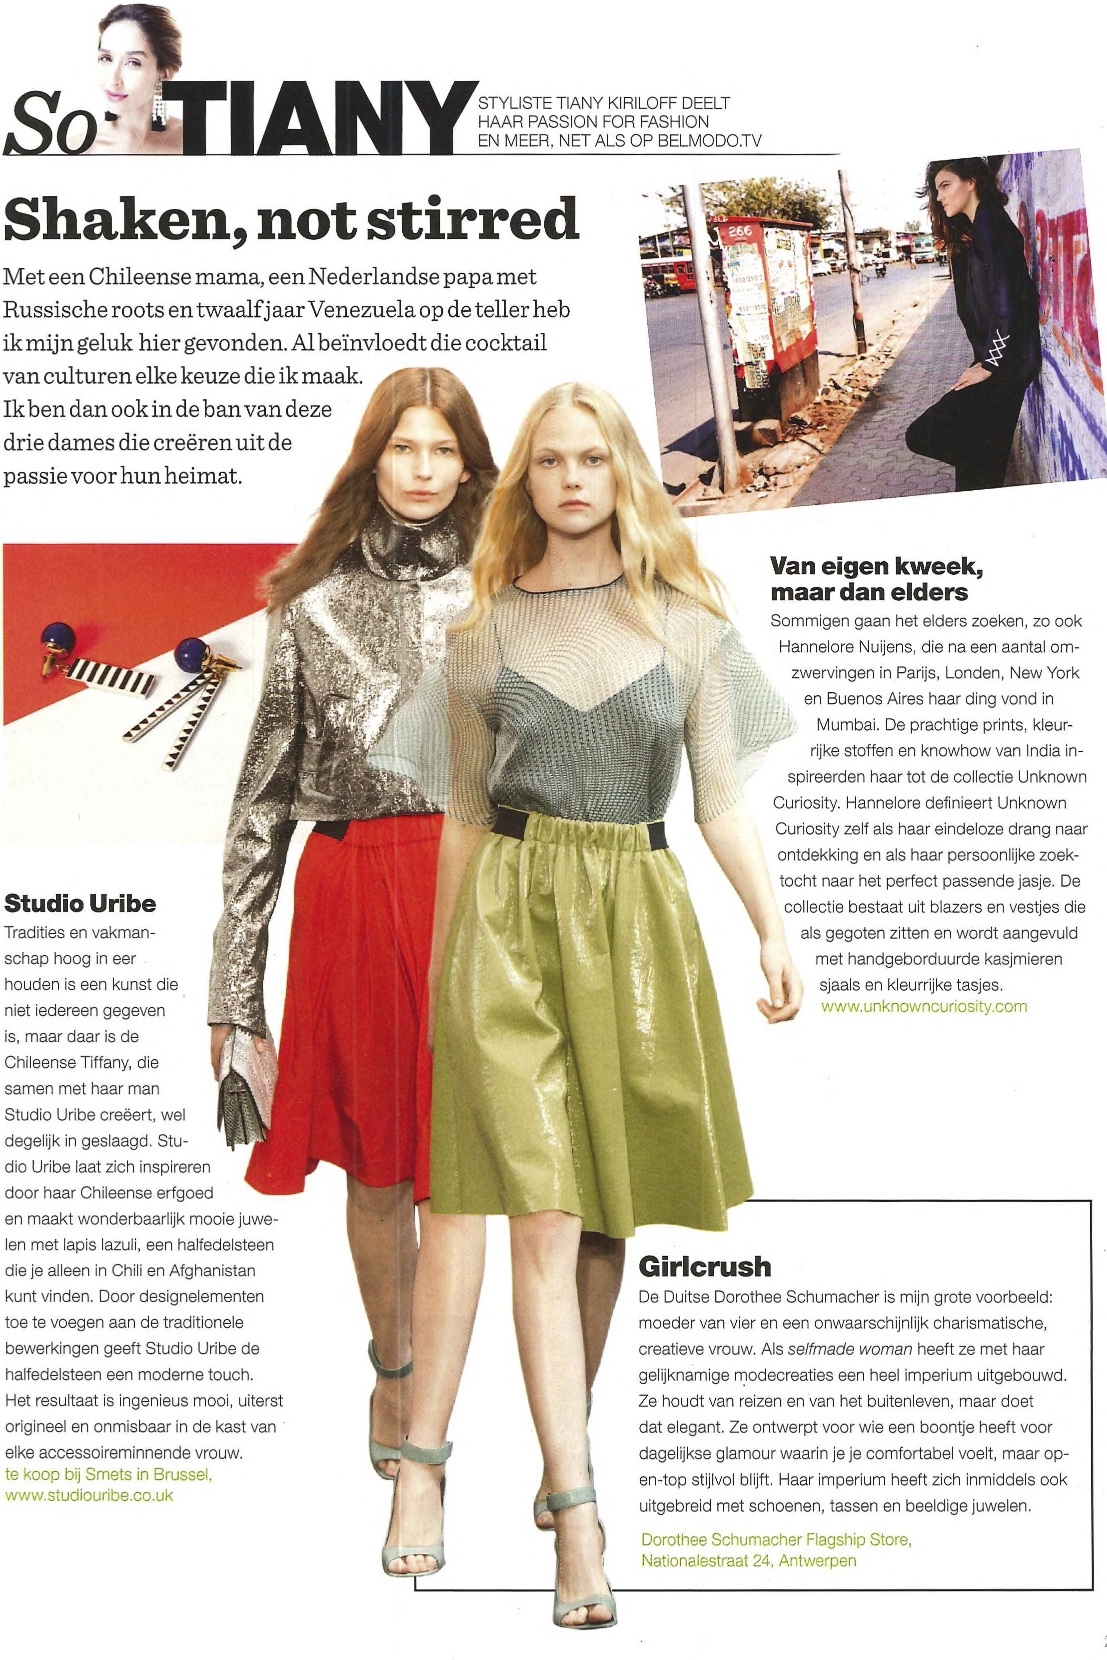 Nieuwsblad Magazine- 7thMarch 2015